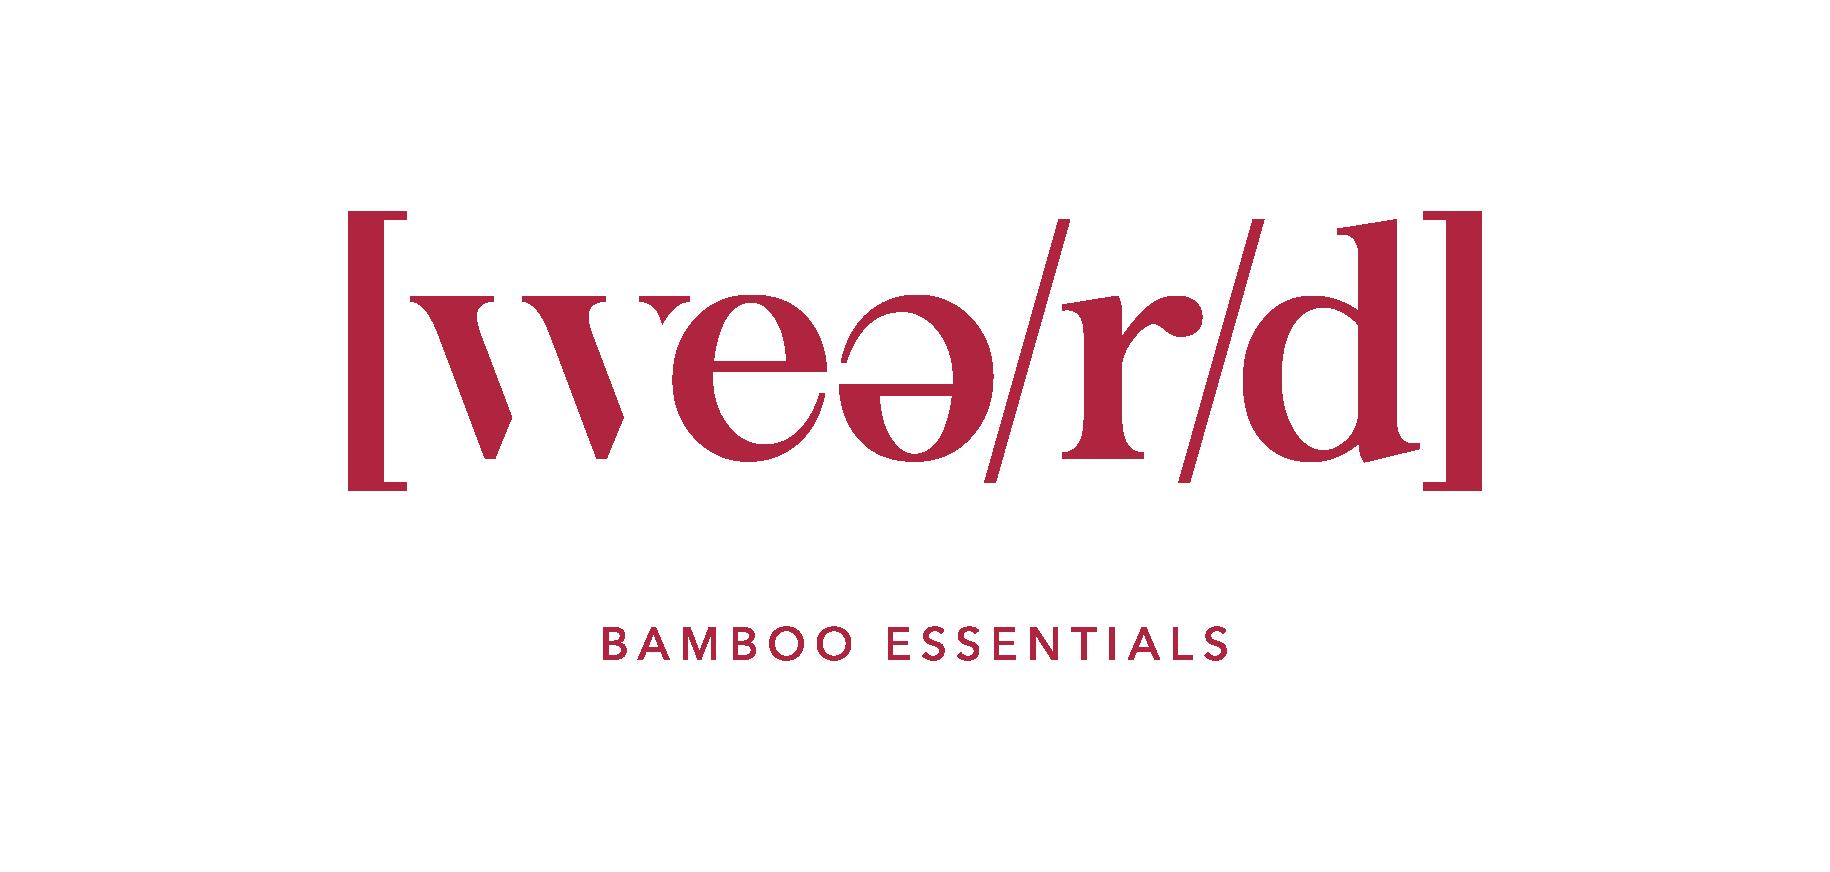 Weard-bamboo-essentials